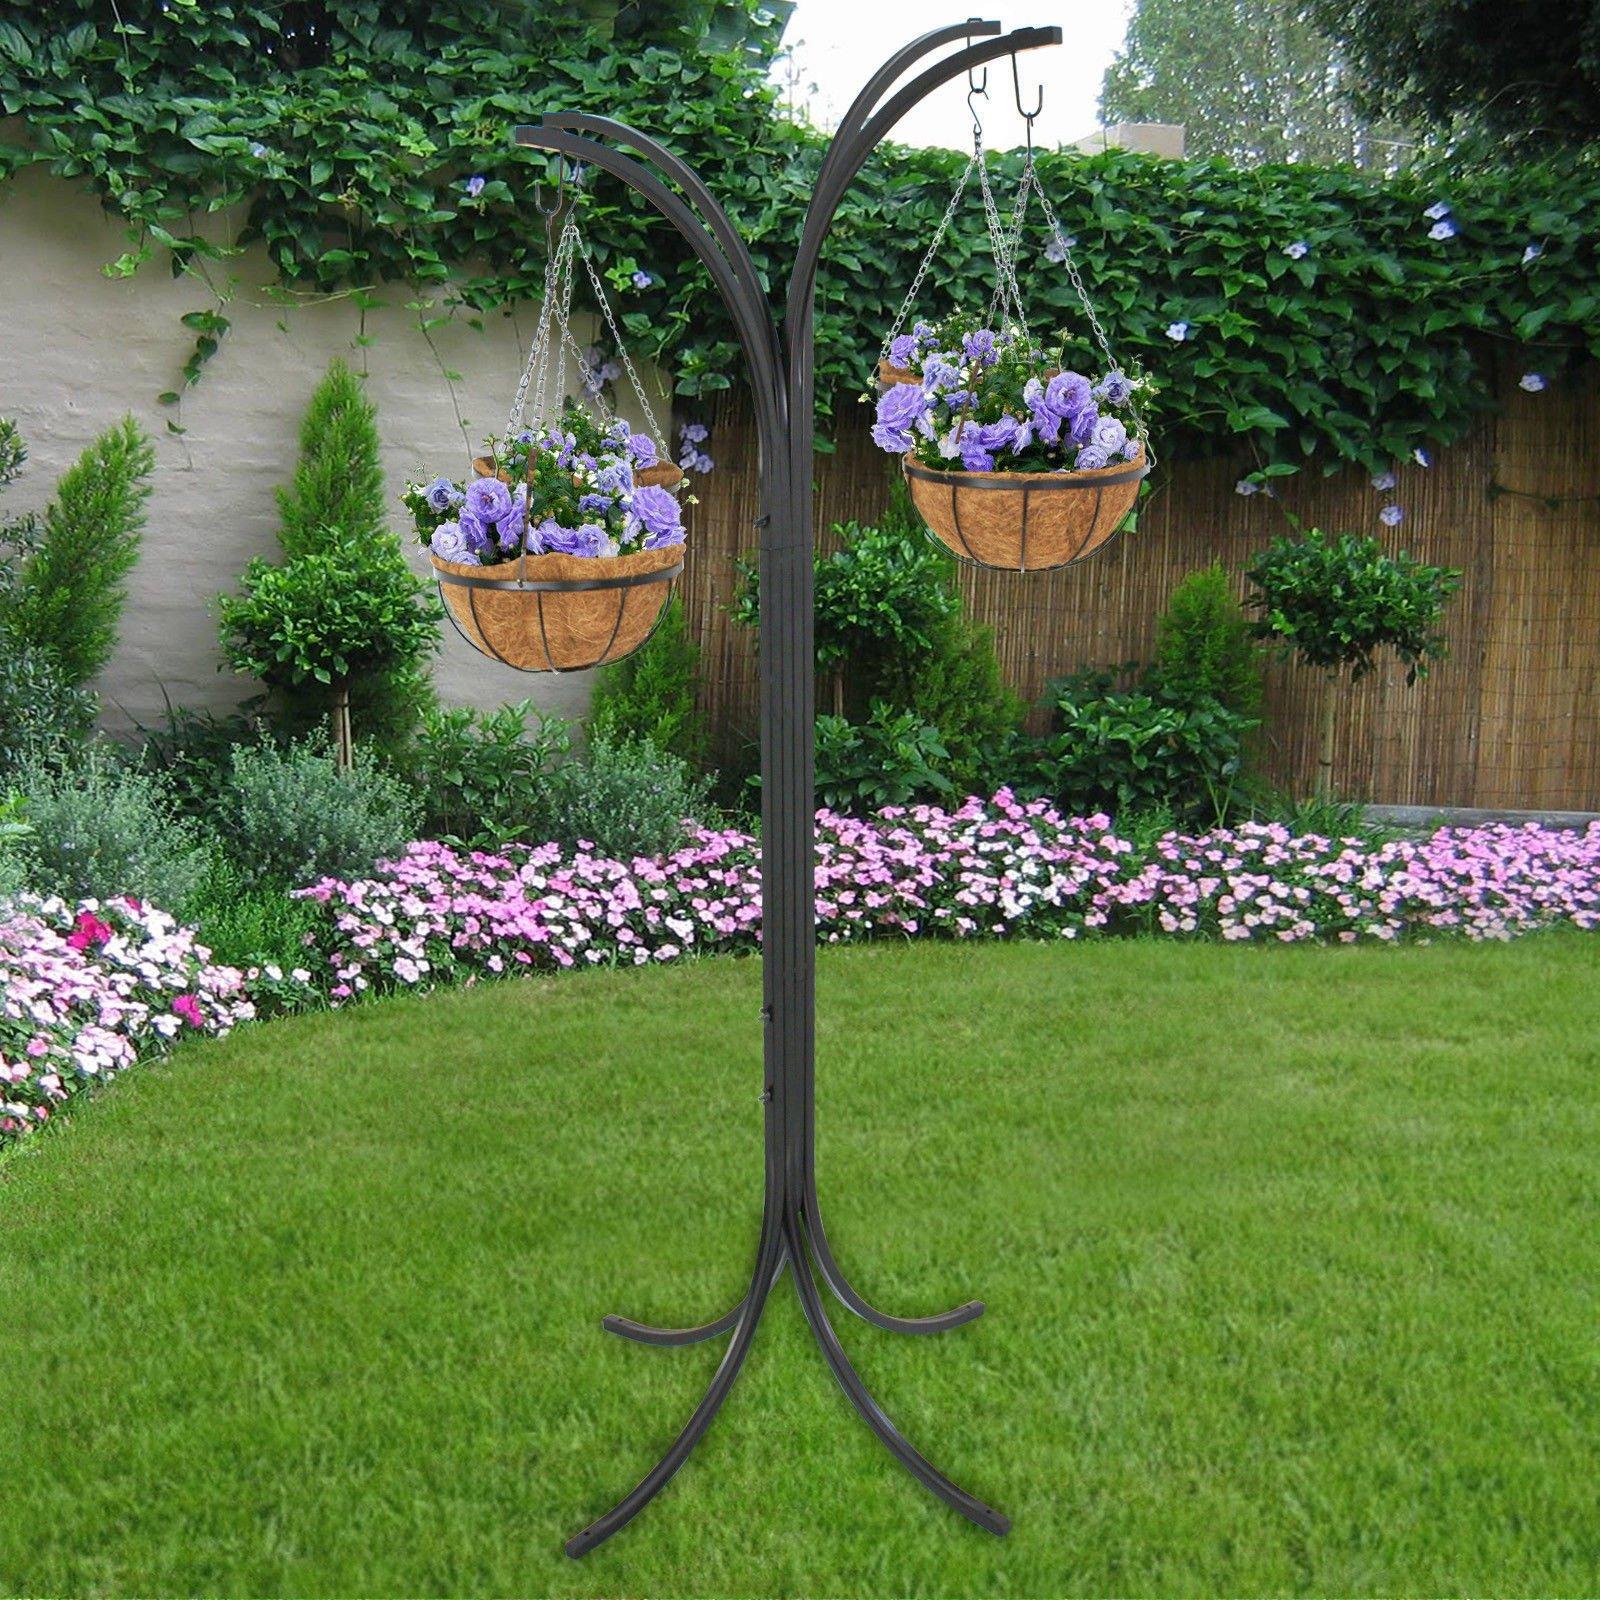 Plant Stand Hanging Holder Basket Patio Outdoor Flower Decor Garden Planter New